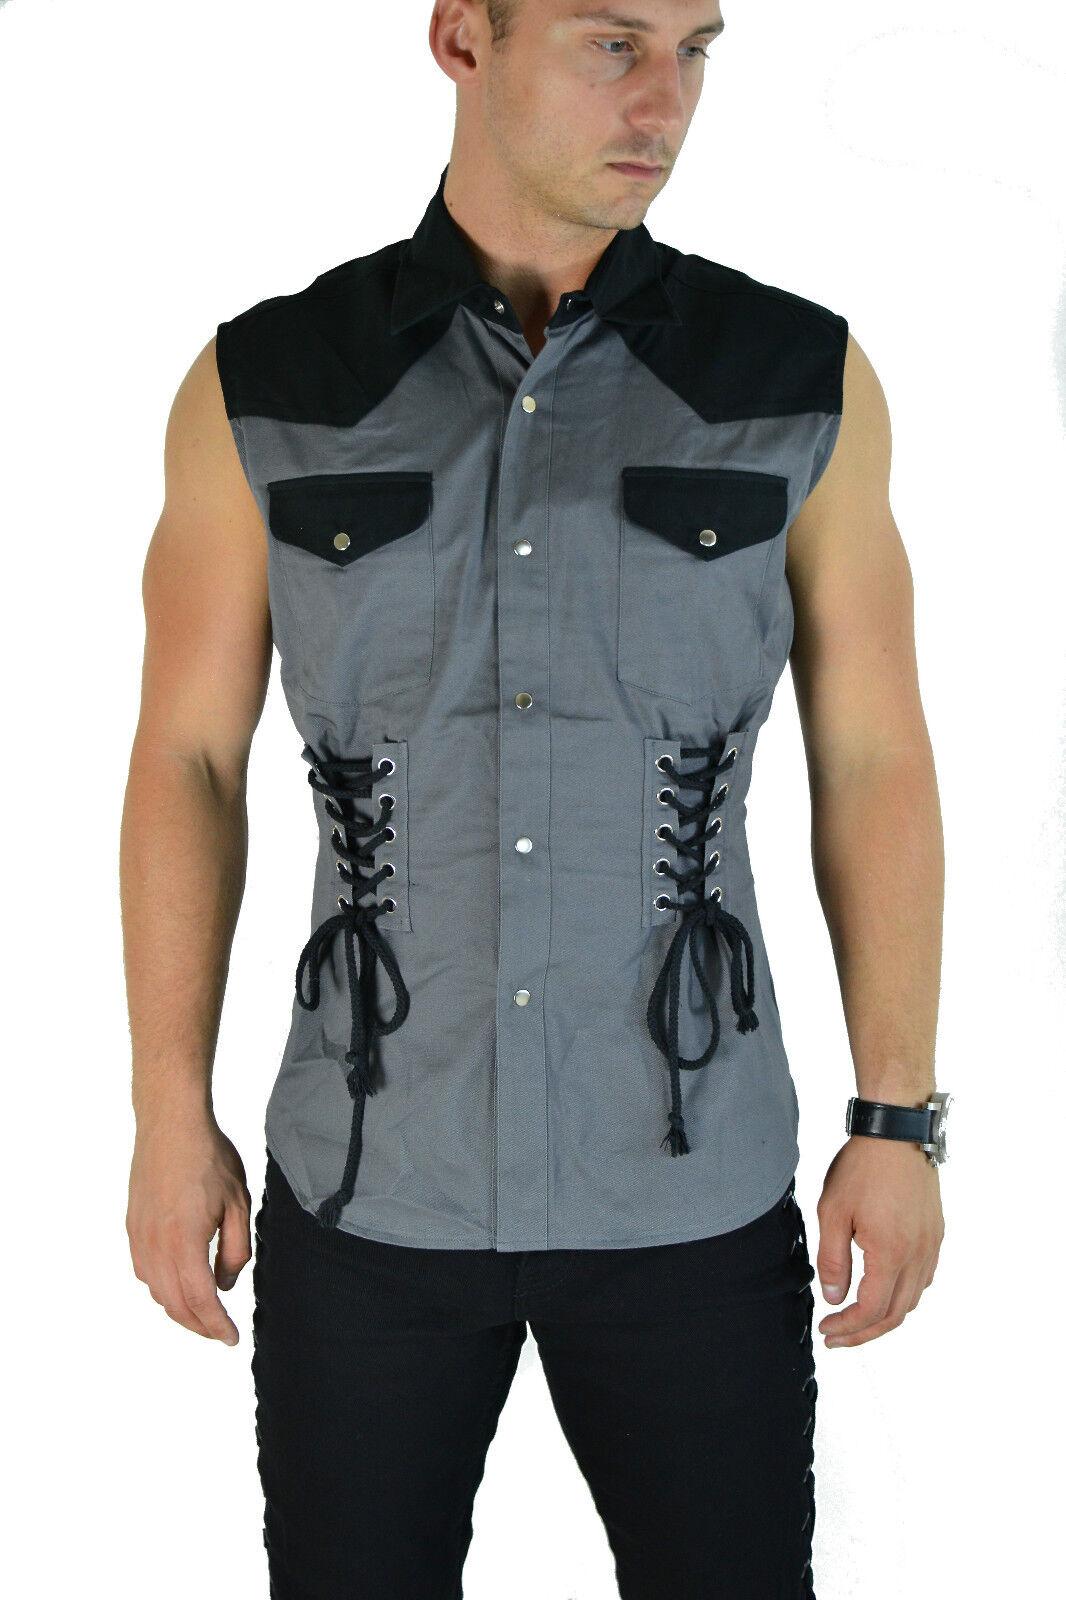 SHRINE GOTHIC CORSET STEAMPUNK ROCKER FETISH COWBOY BIKER SLEEVELESS VEST SHIRT Casual Button-Down Shirts